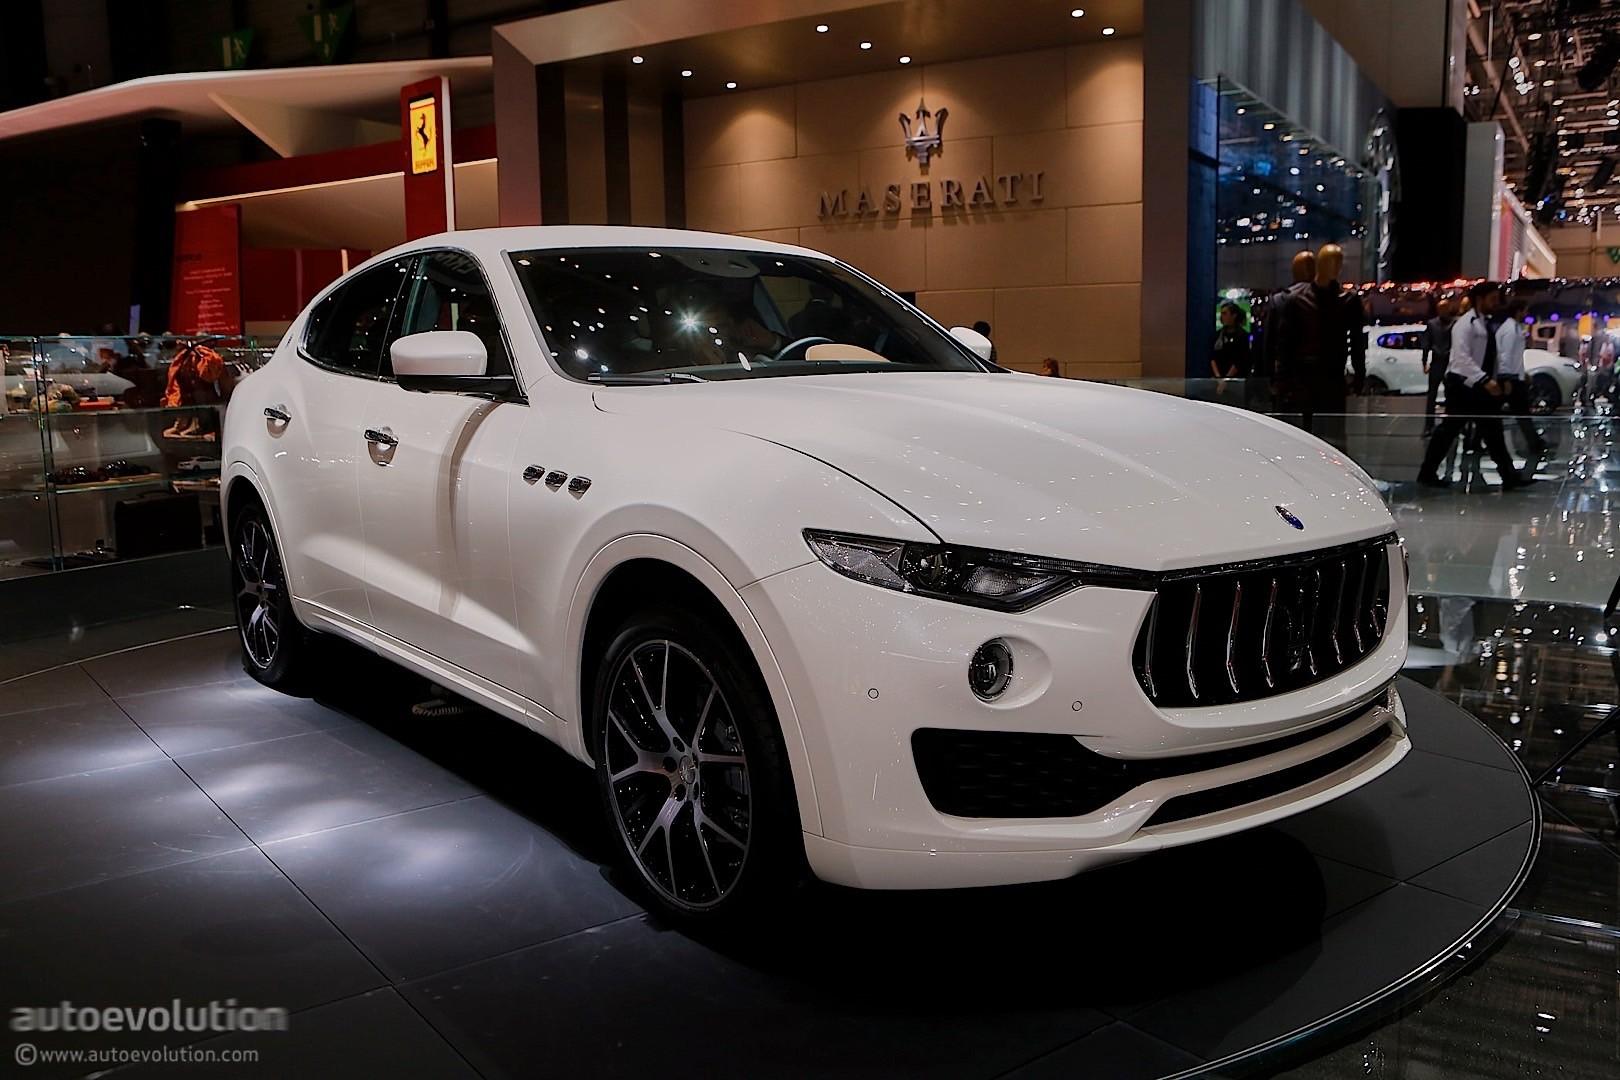 Infiniti Suv 2017 >> Maserati Levante SUV Looks like a Ghibli on Stilts in Geneva - autoevolution